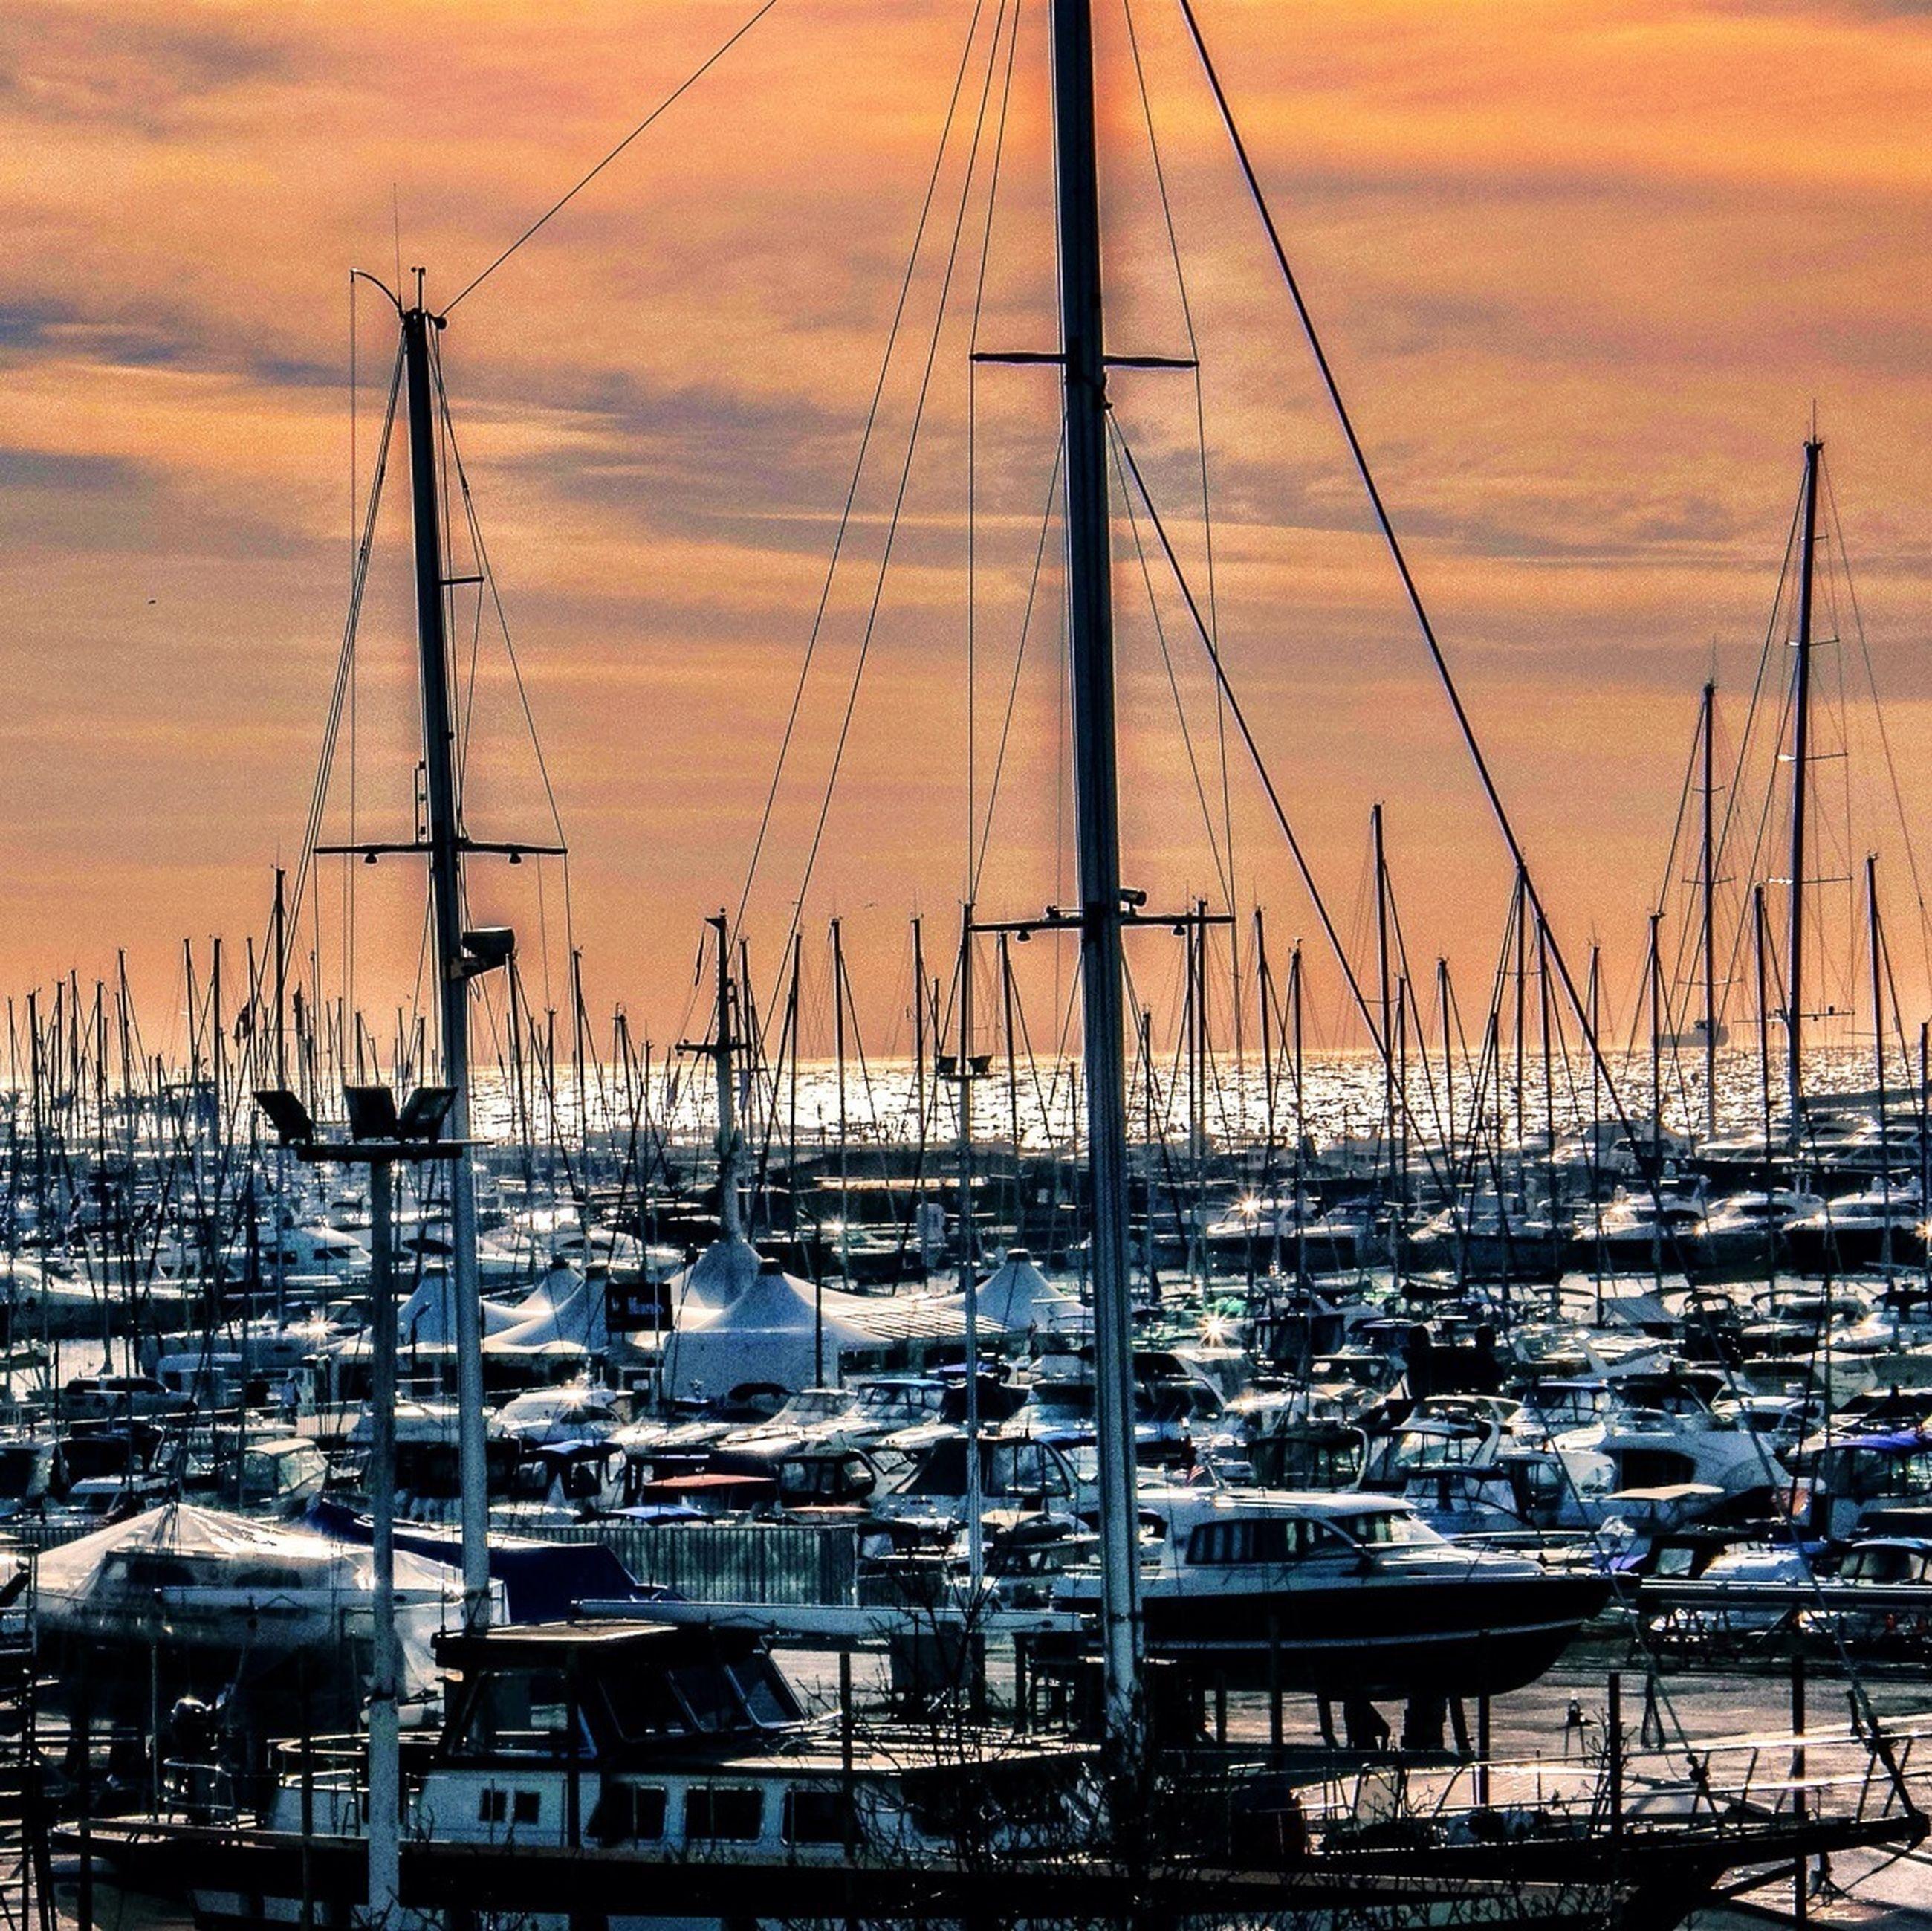 nautical vessel, mast, transportation, moored, boat, mode of transport, sunset, harbor, sailboat, water, sky, sea, cloud - sky, orange color, travel, marina, no people, outdoors, nature, cloud